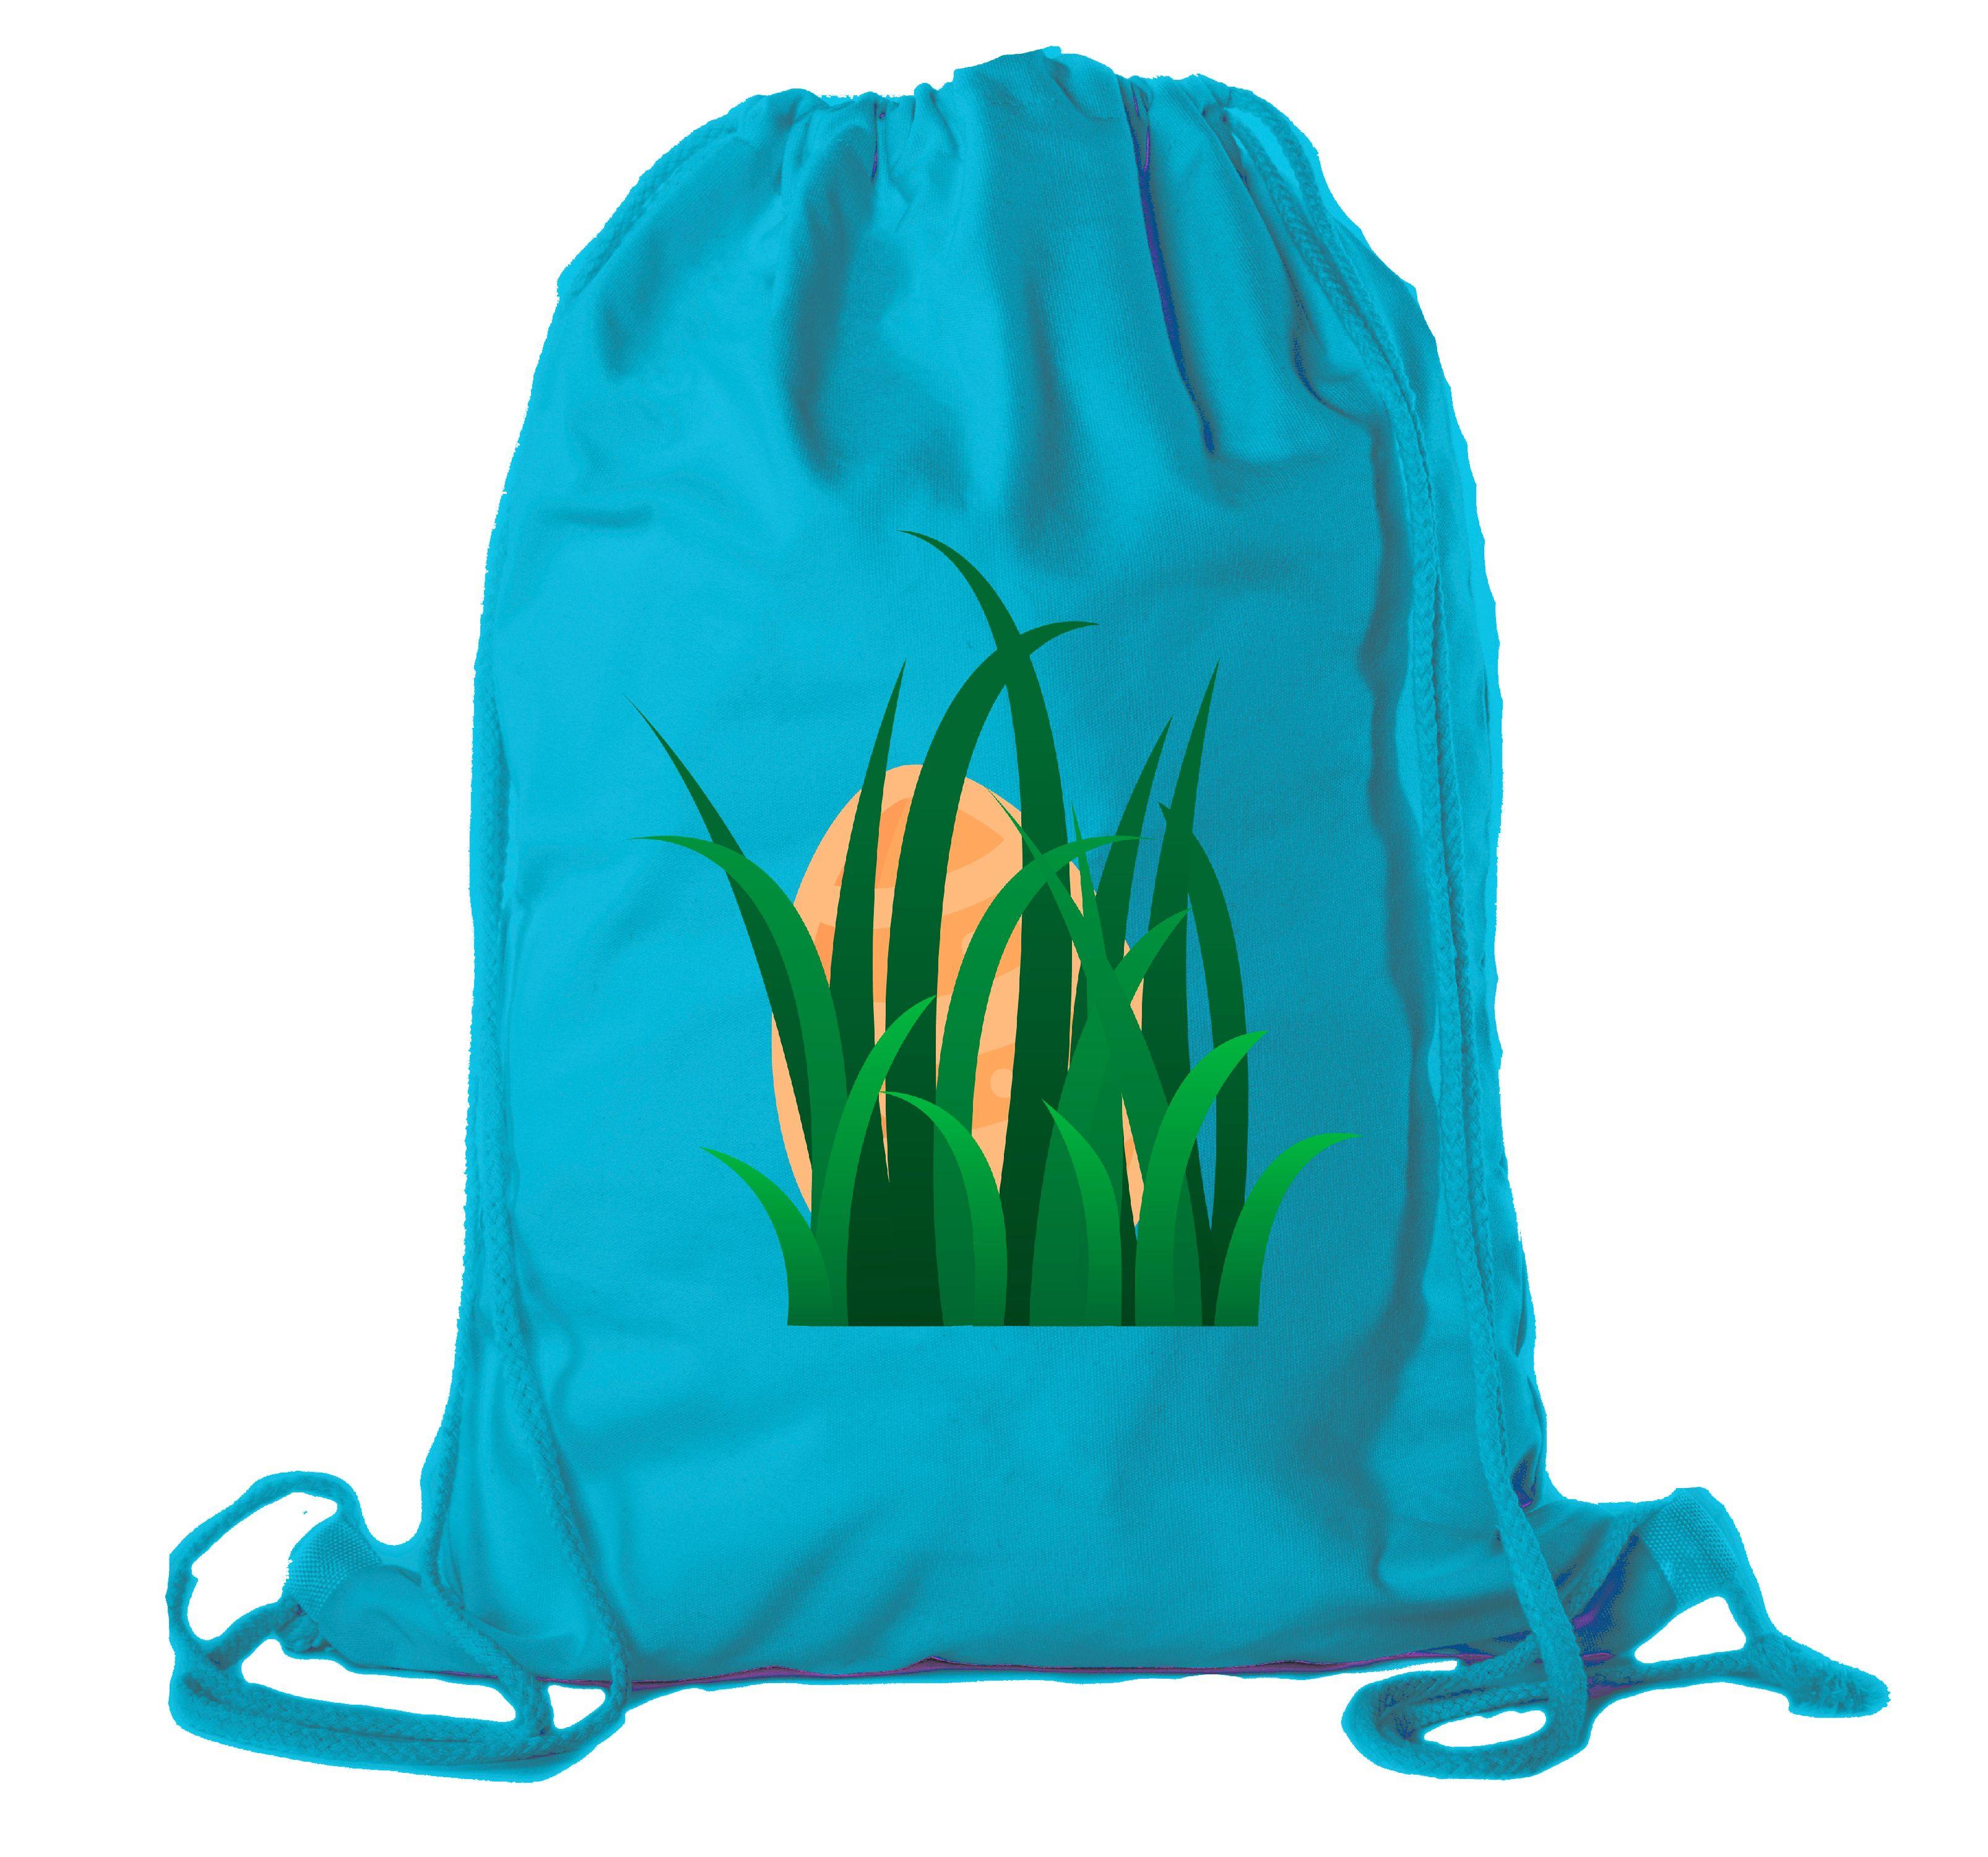 Easter Basket Backpack Bulk Cotton Drawstring Cinch Bags Easter Bunny Gift Bags - No Peaking